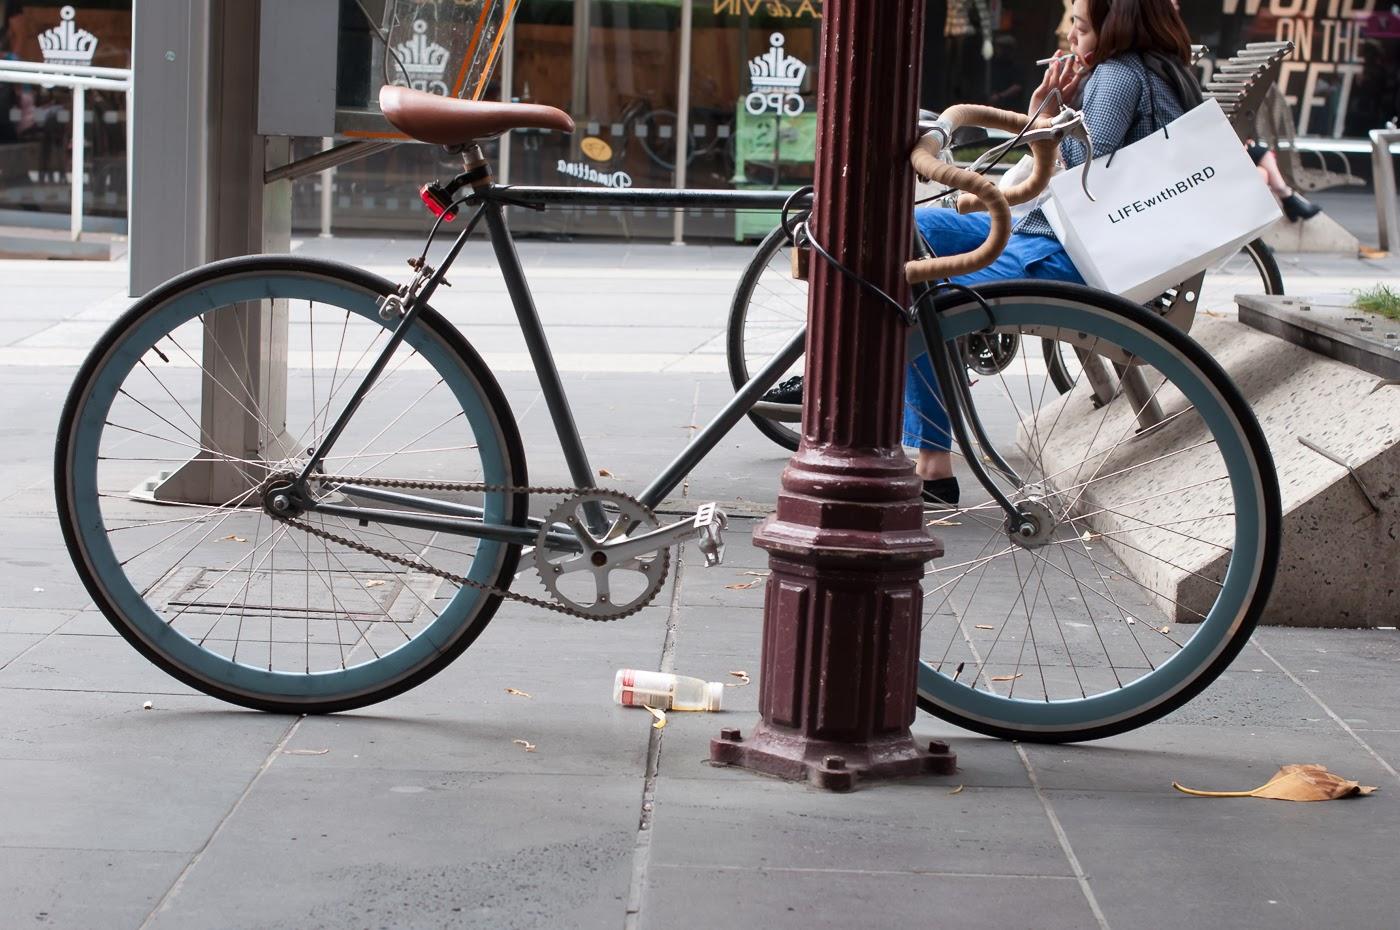 single speed, bike, bicycle, tim macauley, the biketorialist, melbourne, conversion, chain, tensioner road bike,  bourke st, custom, frame